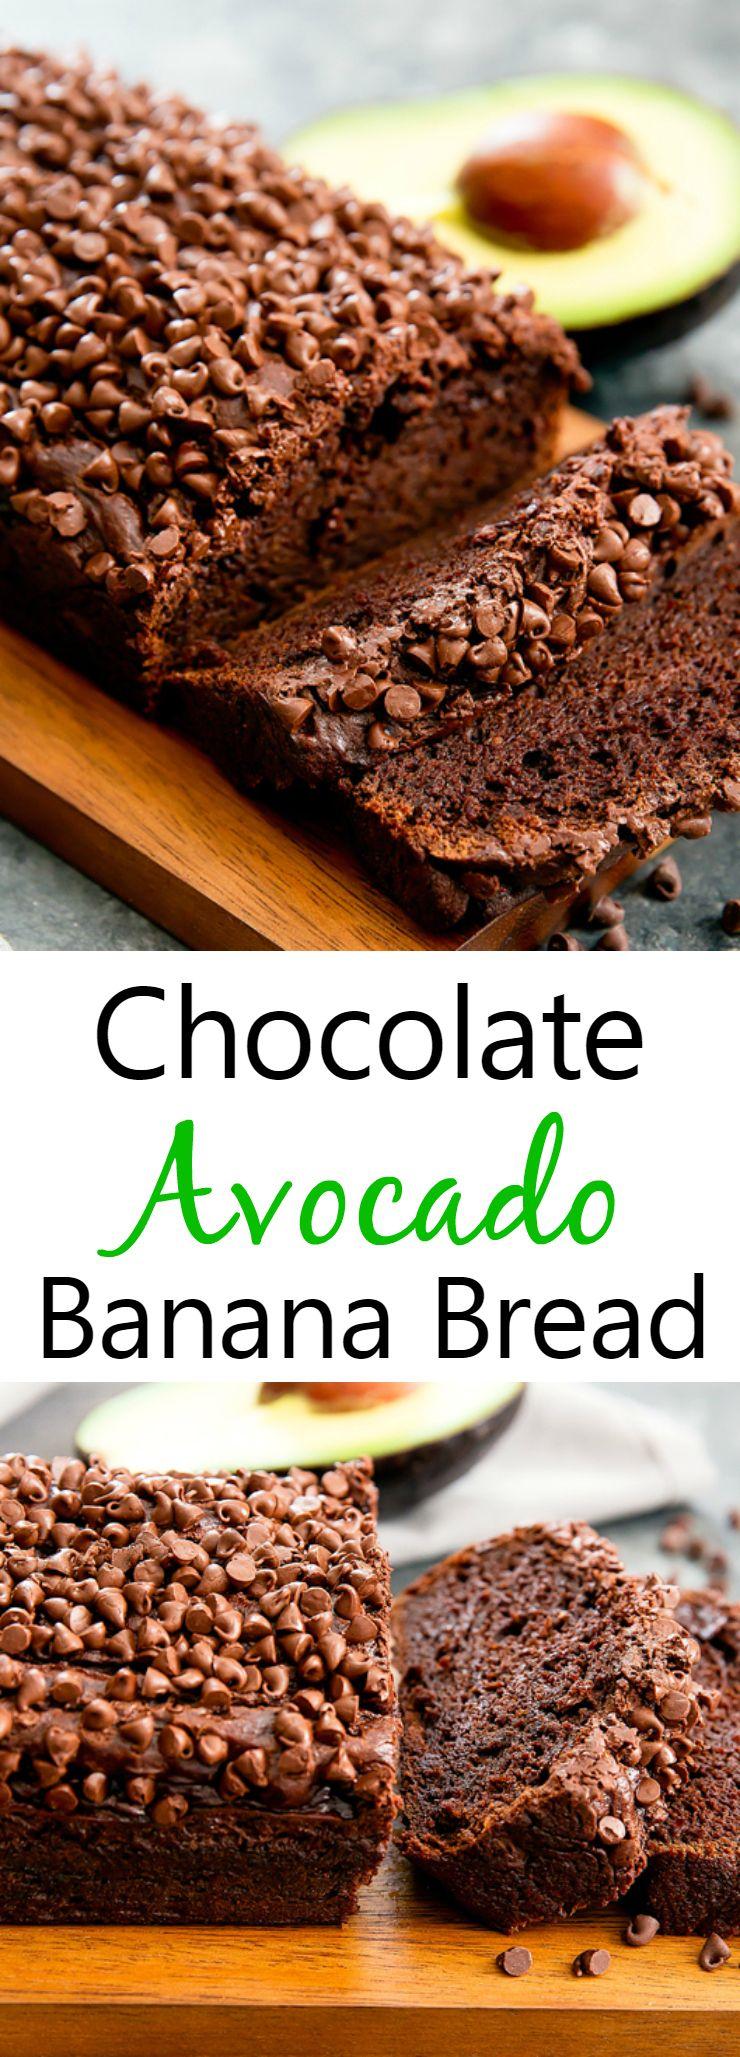 Chocolate avocado banana bread recipe banana bread bananas and chocolate avocado banana bread forumfinder Image collections